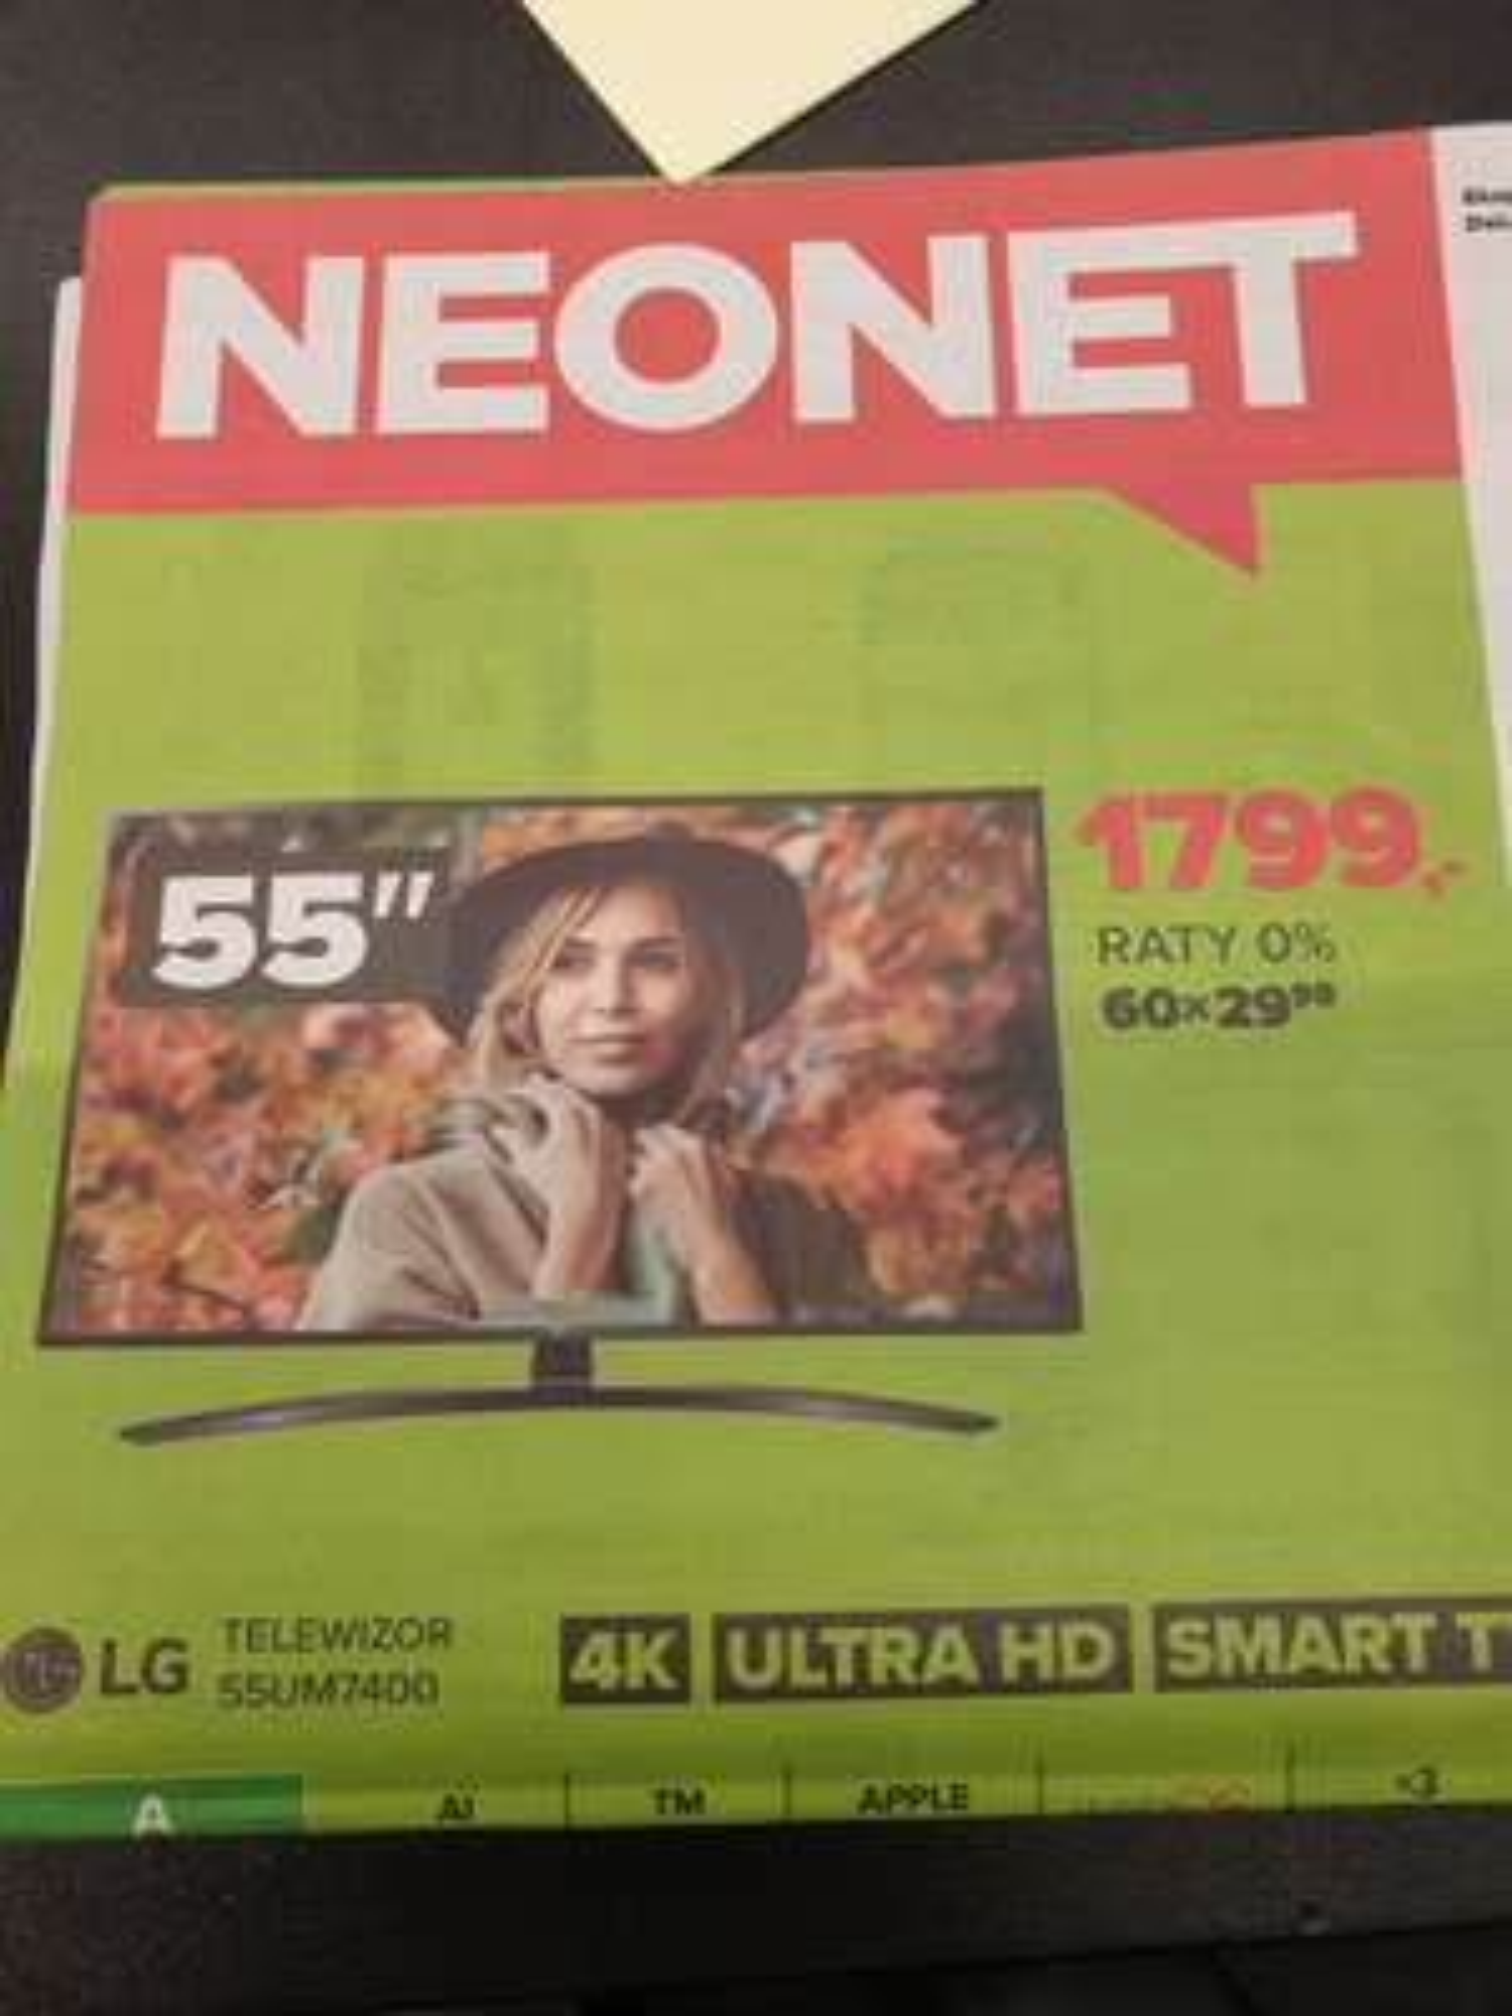 Tv LG 55UM7400 za 1799+pilot magic remote za 50zł Neonet Środa Wielkopolska